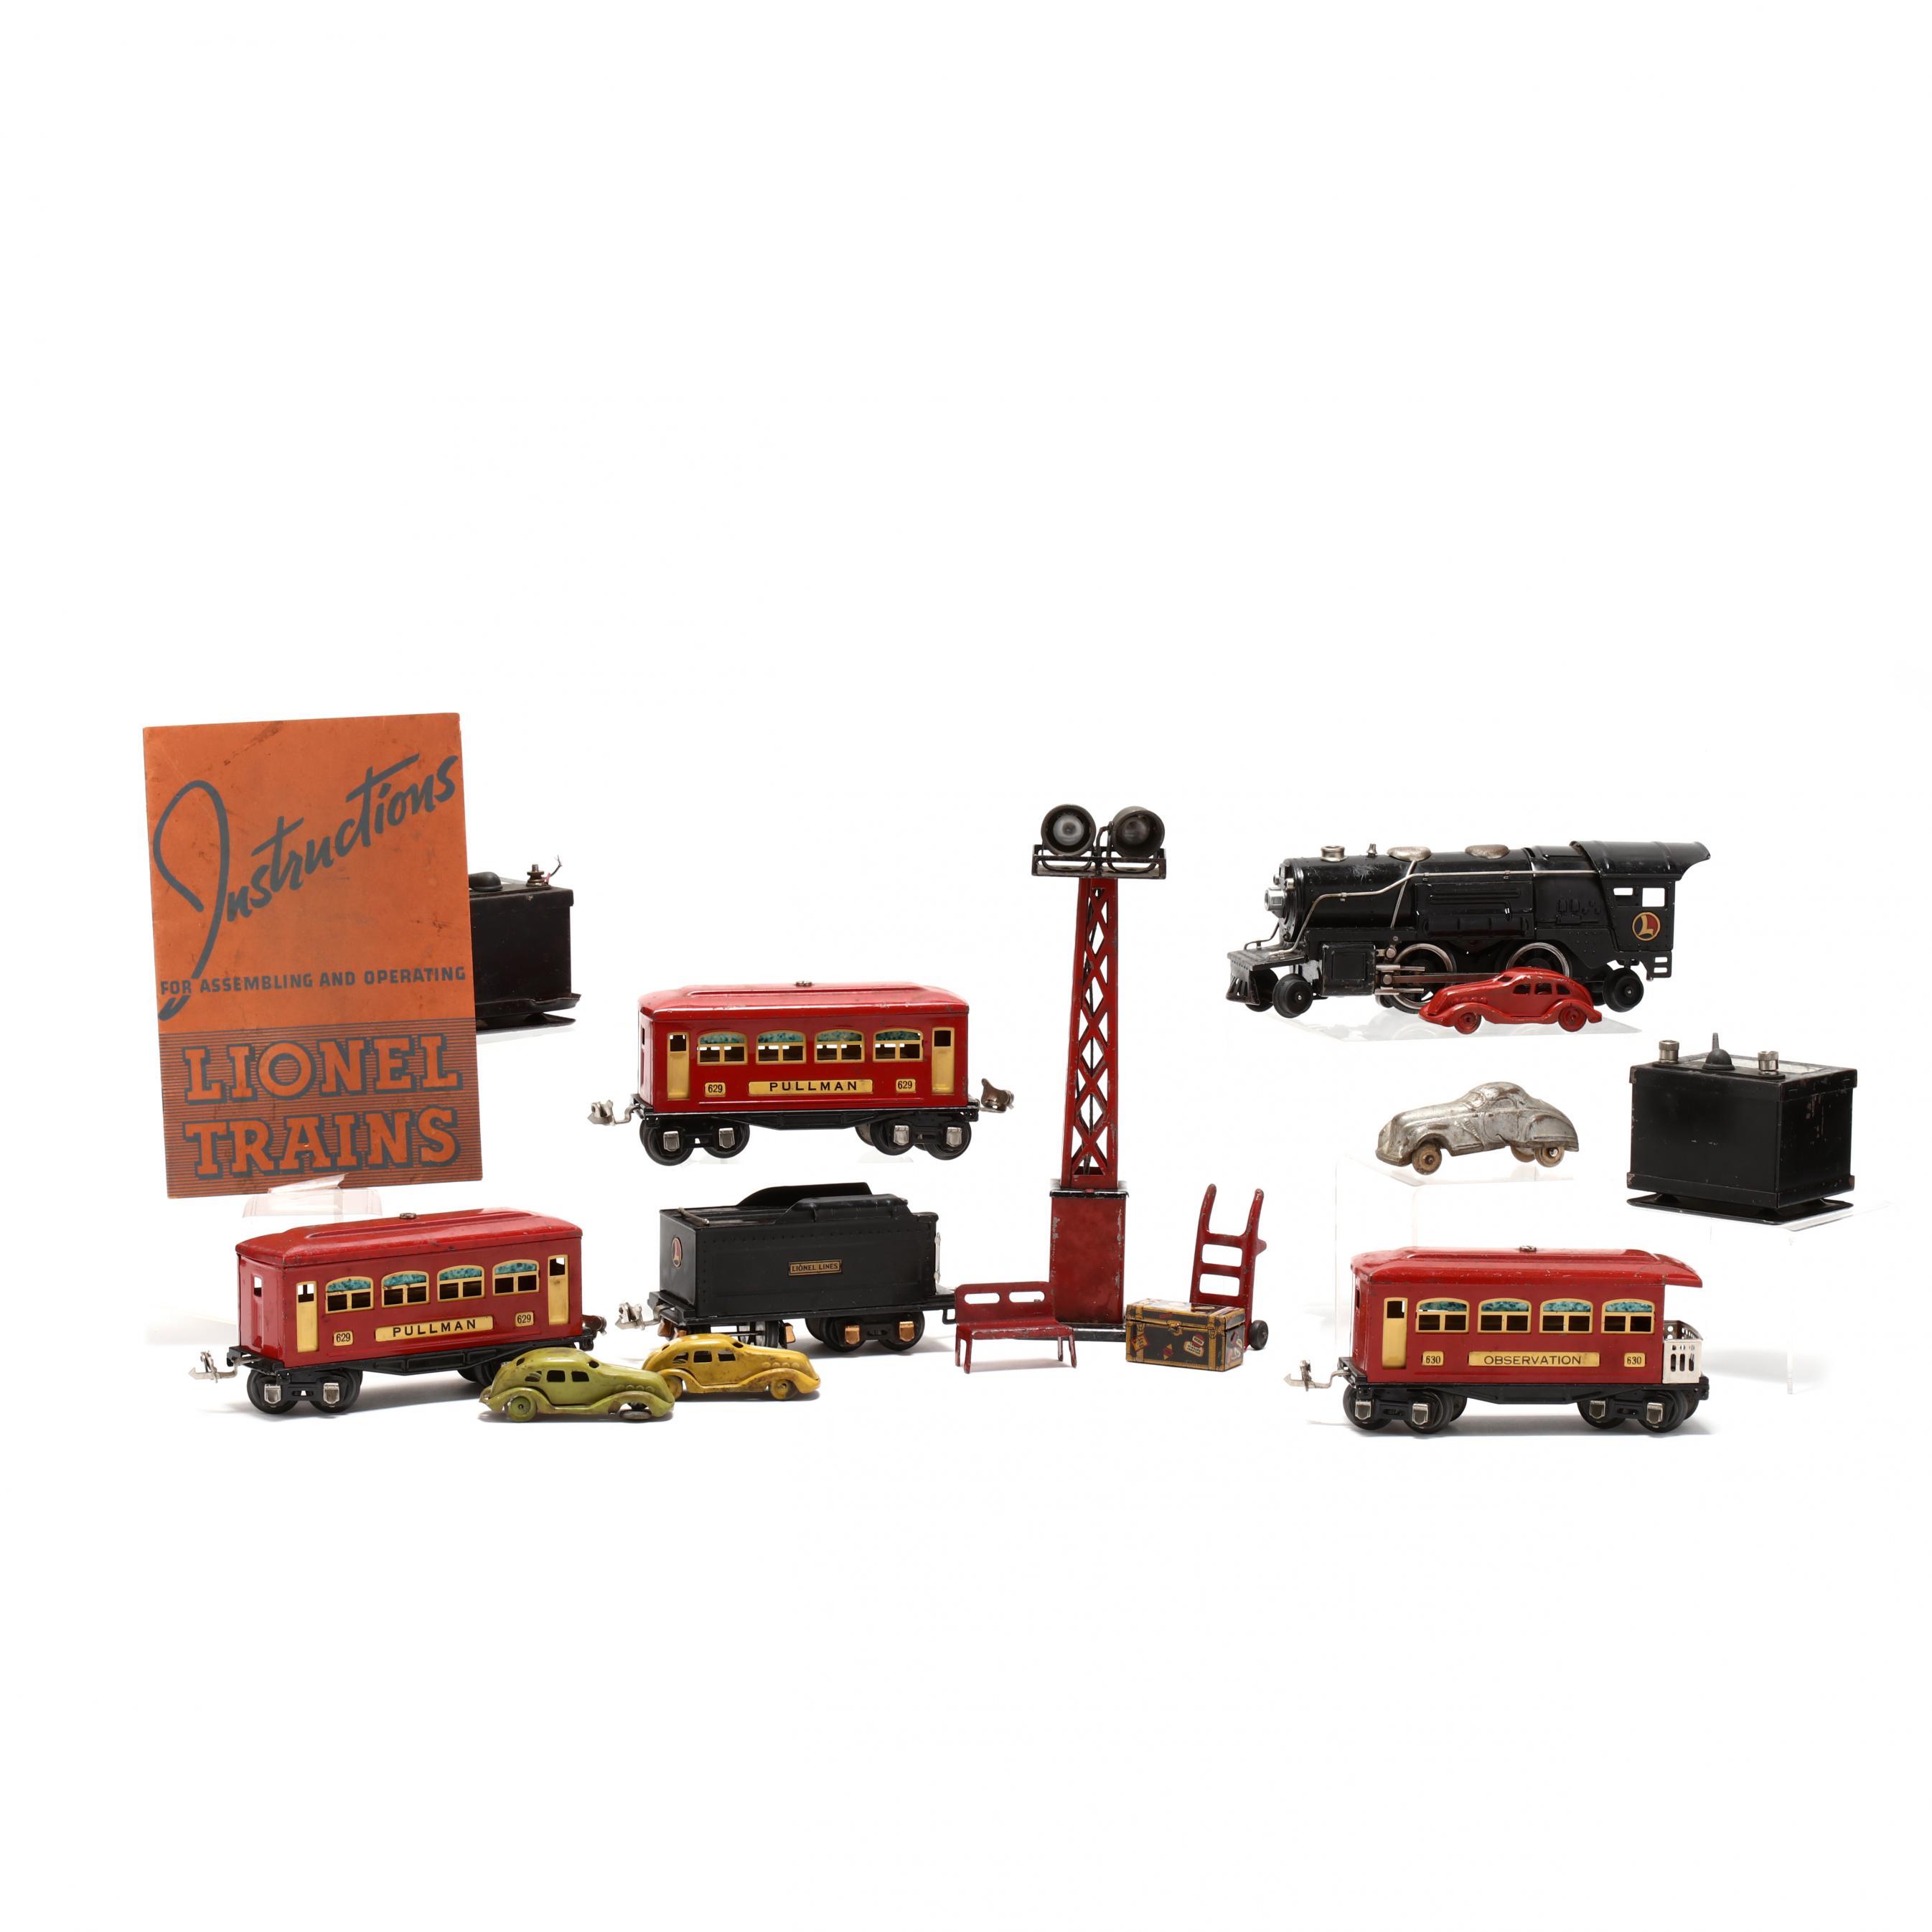 lionel-train-set-in-box-o-gauge-1930s